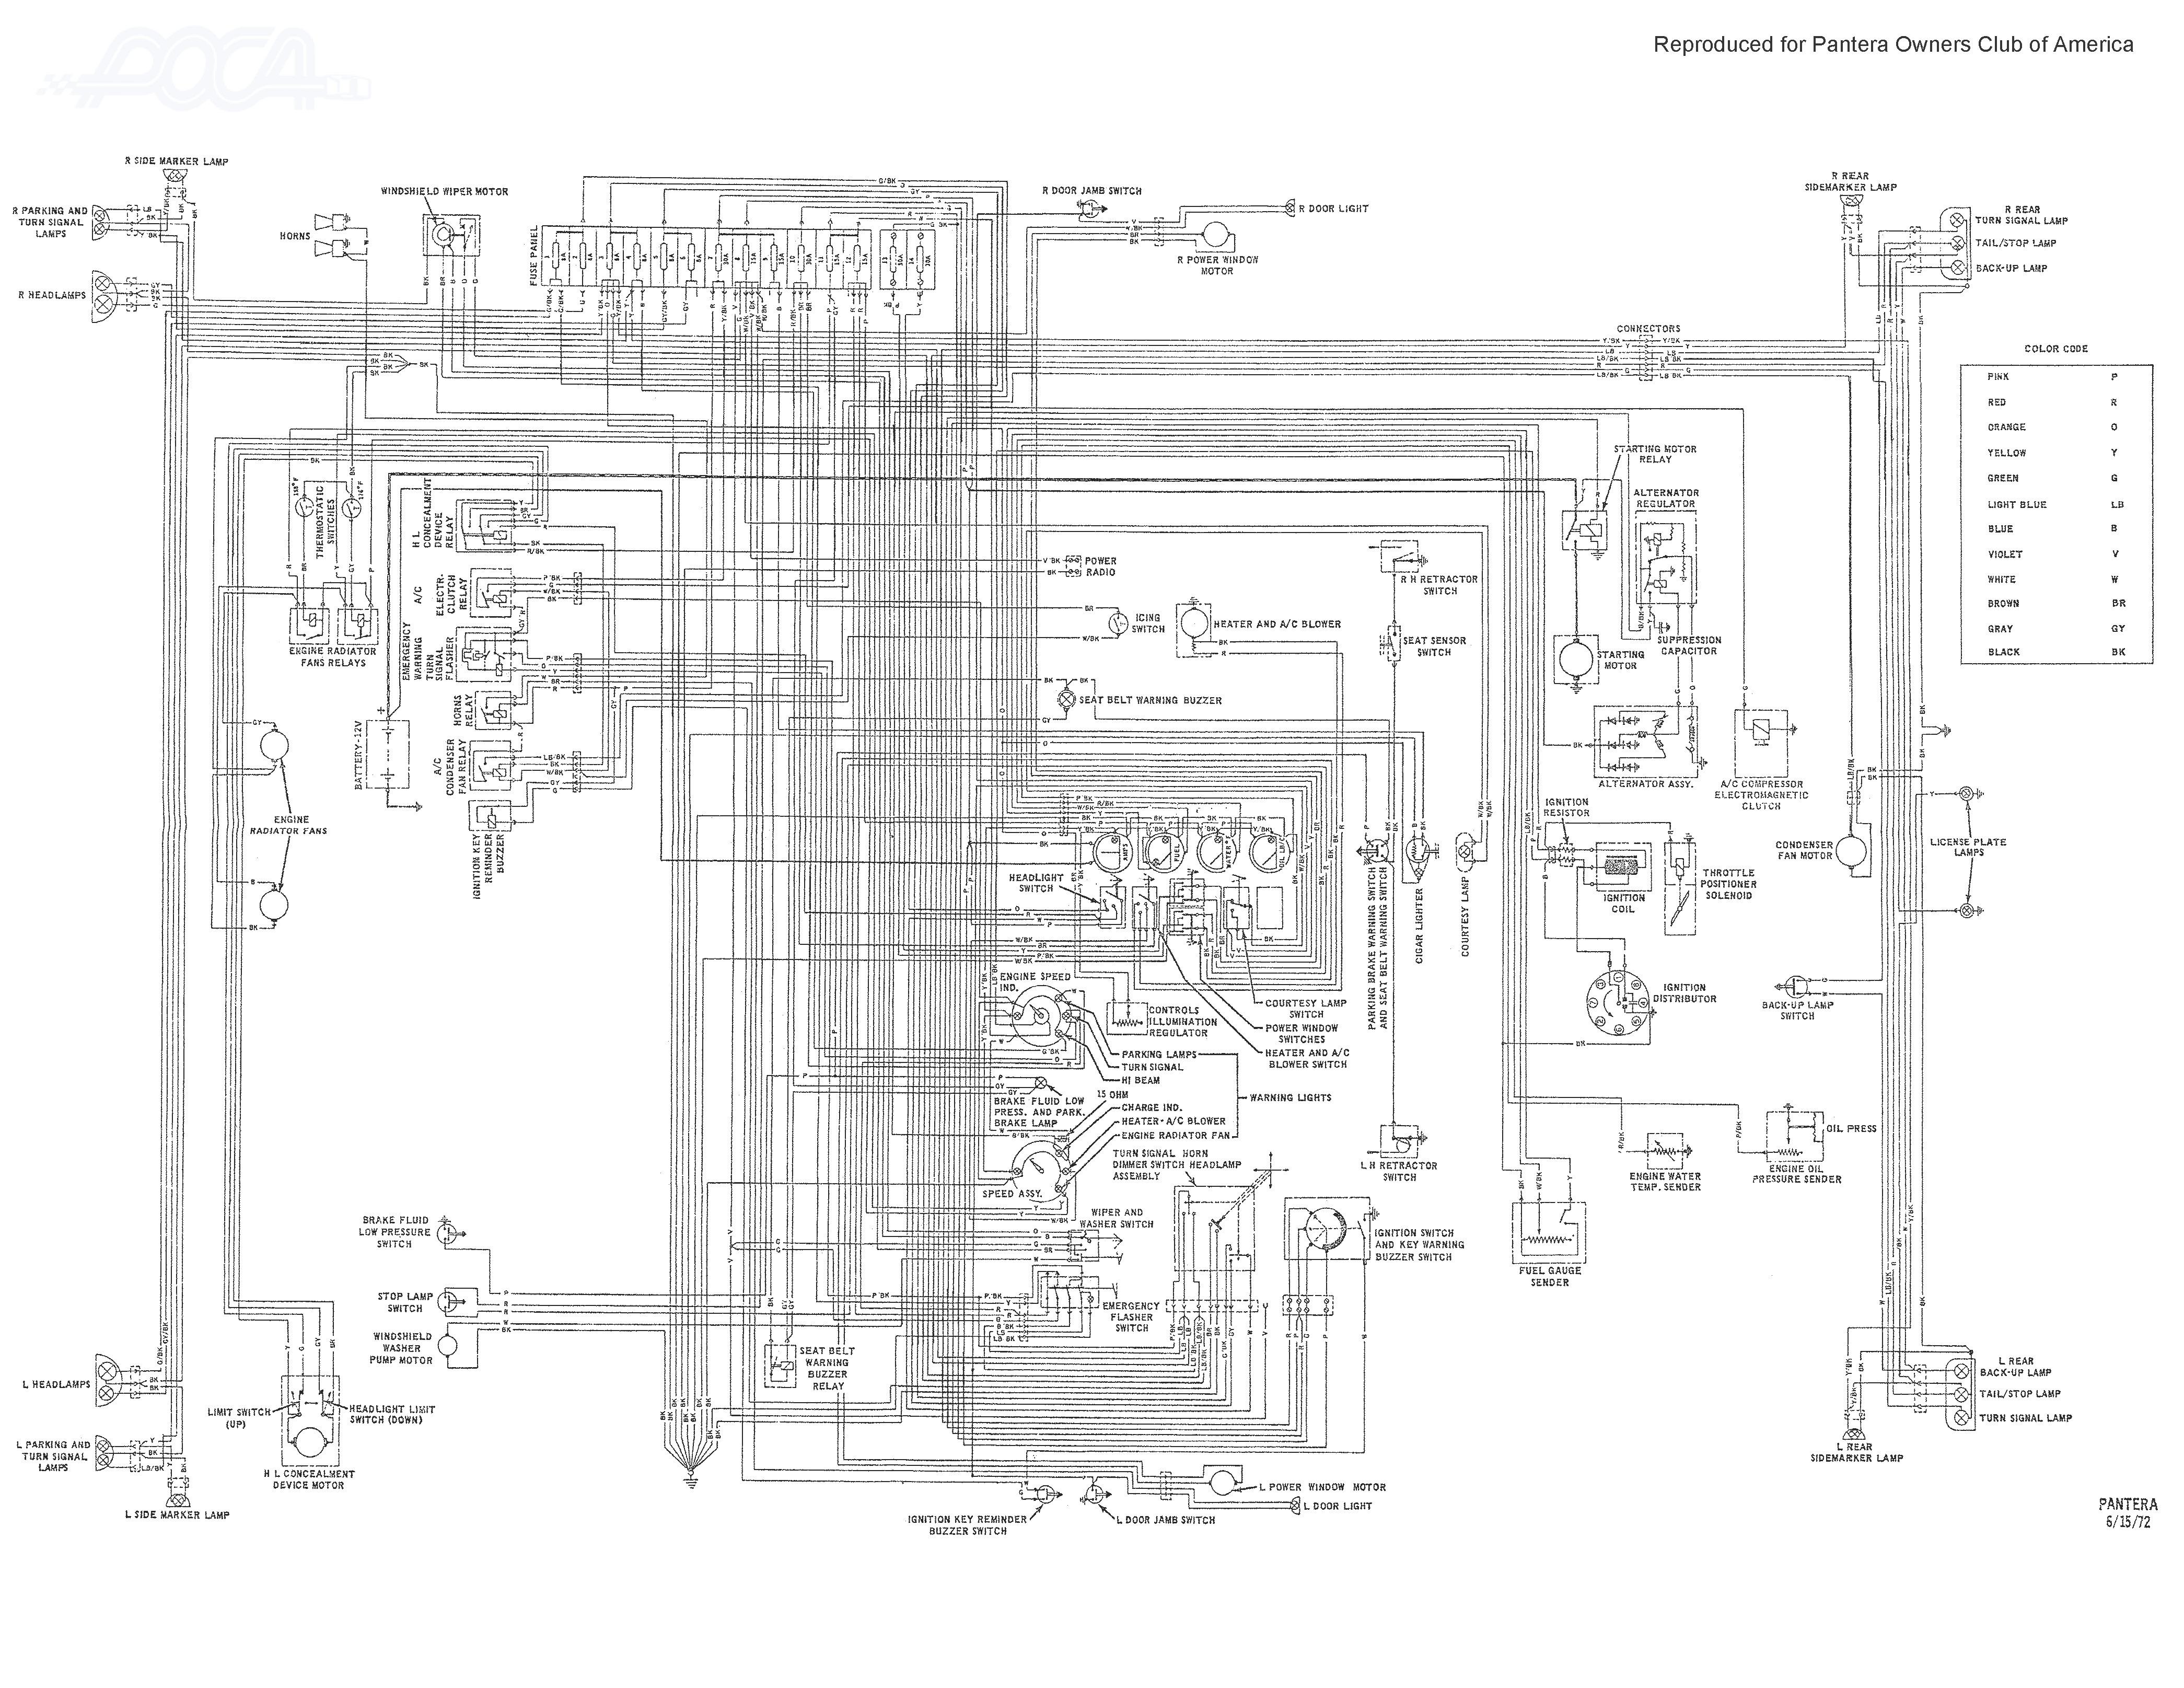 AR_6239] Kenworth Wiring Diagrams Kenworth T800 Wiring Schematic Diagrams  Download DiagramSarc Weveq Sand Gram Rally Impa Rele Pap Hendil Mohammedshrine Librar Wiring  101